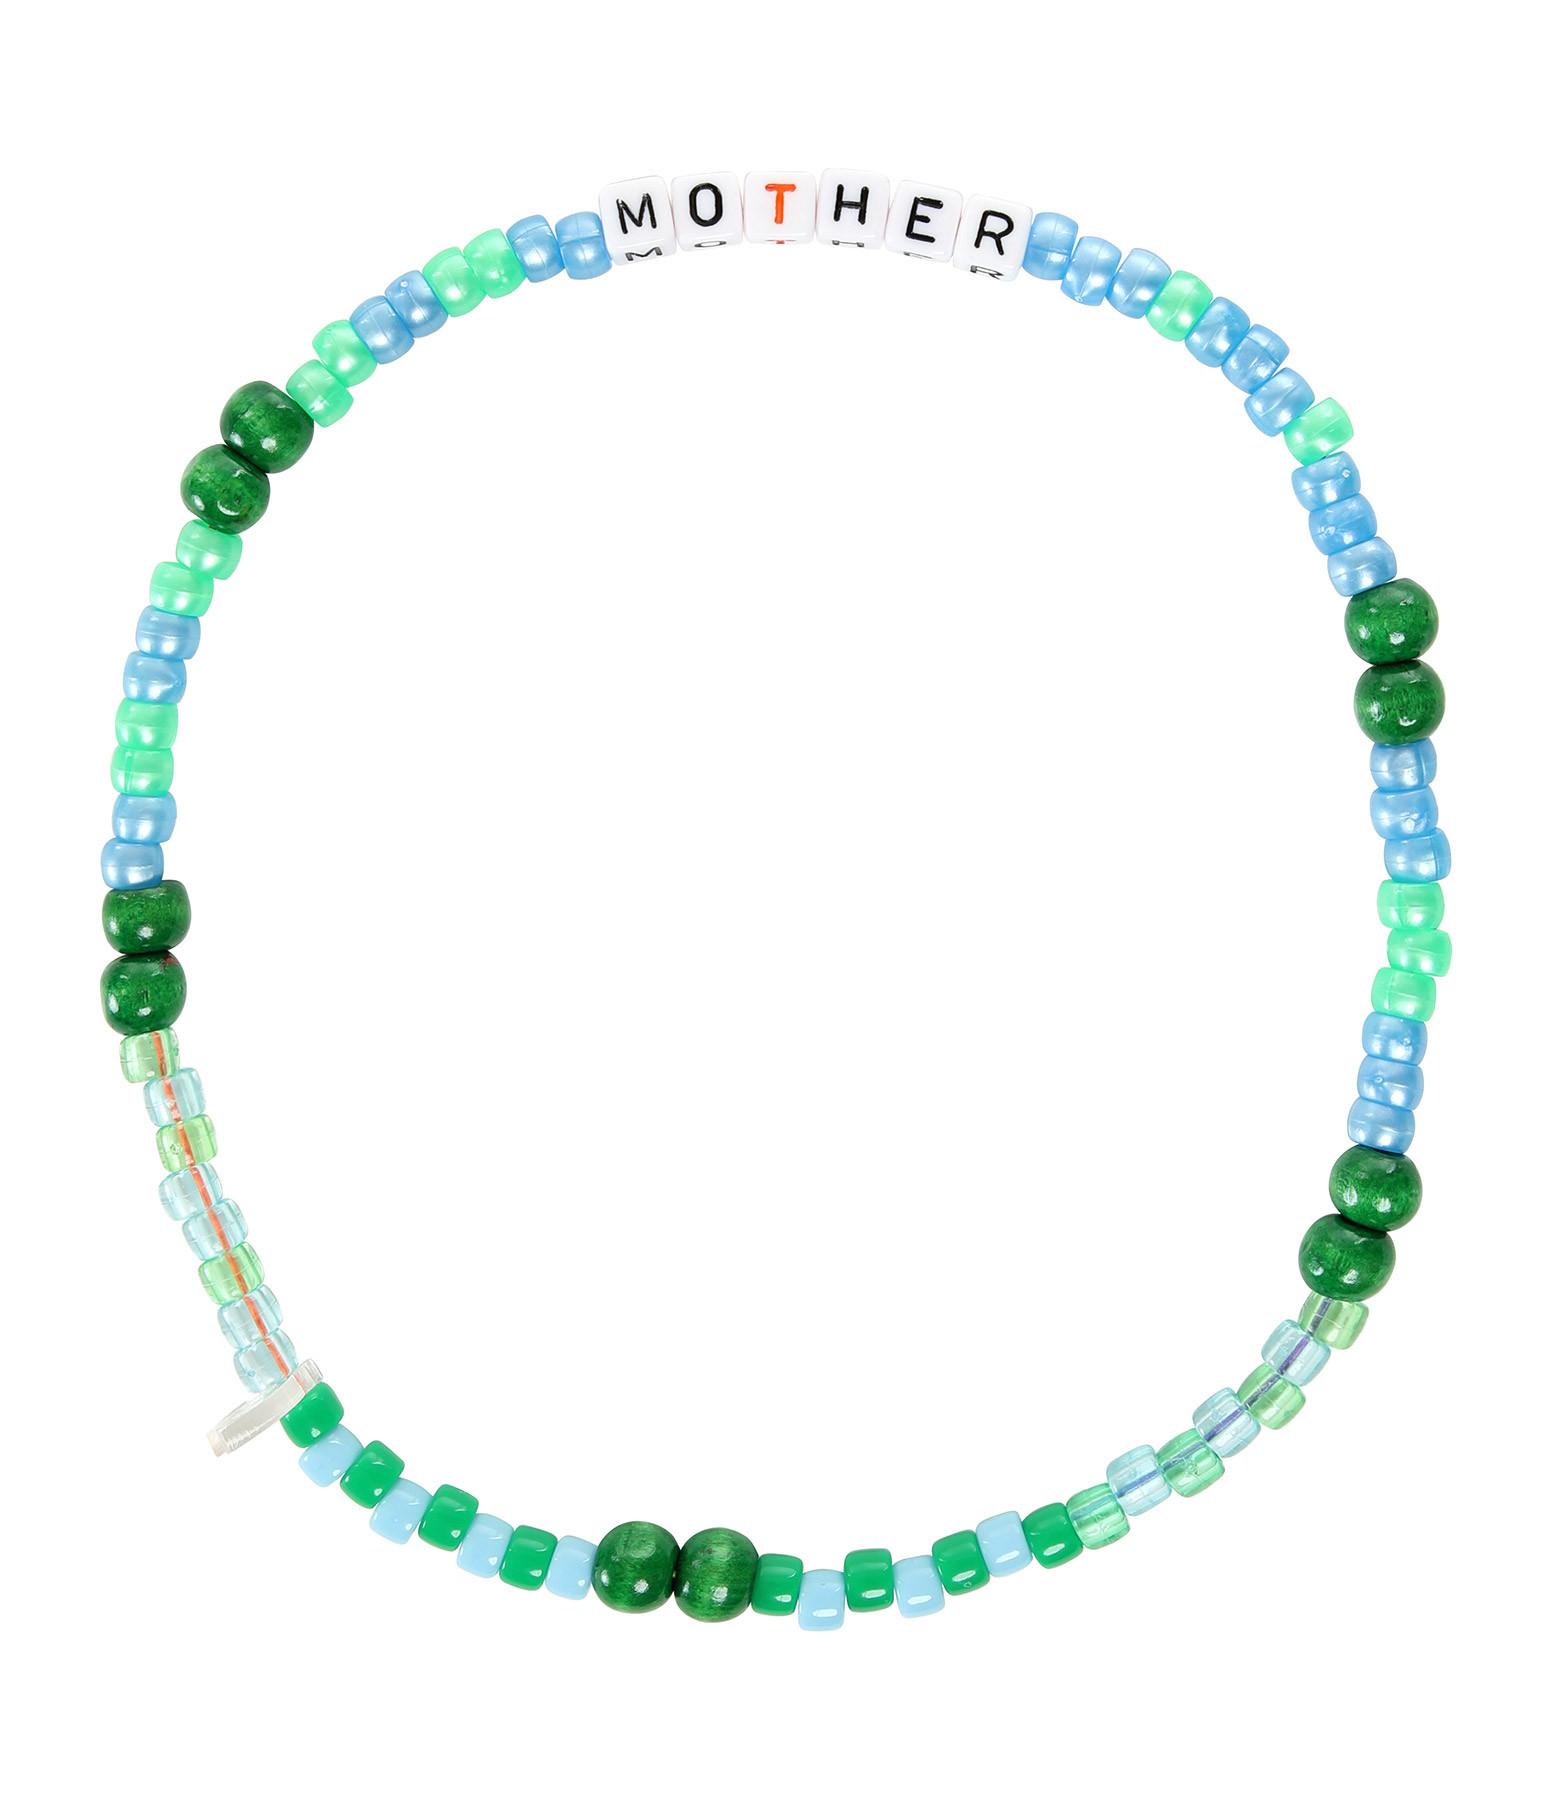 LAUREN RUBINSKI - Collier Love Beads MOTHER